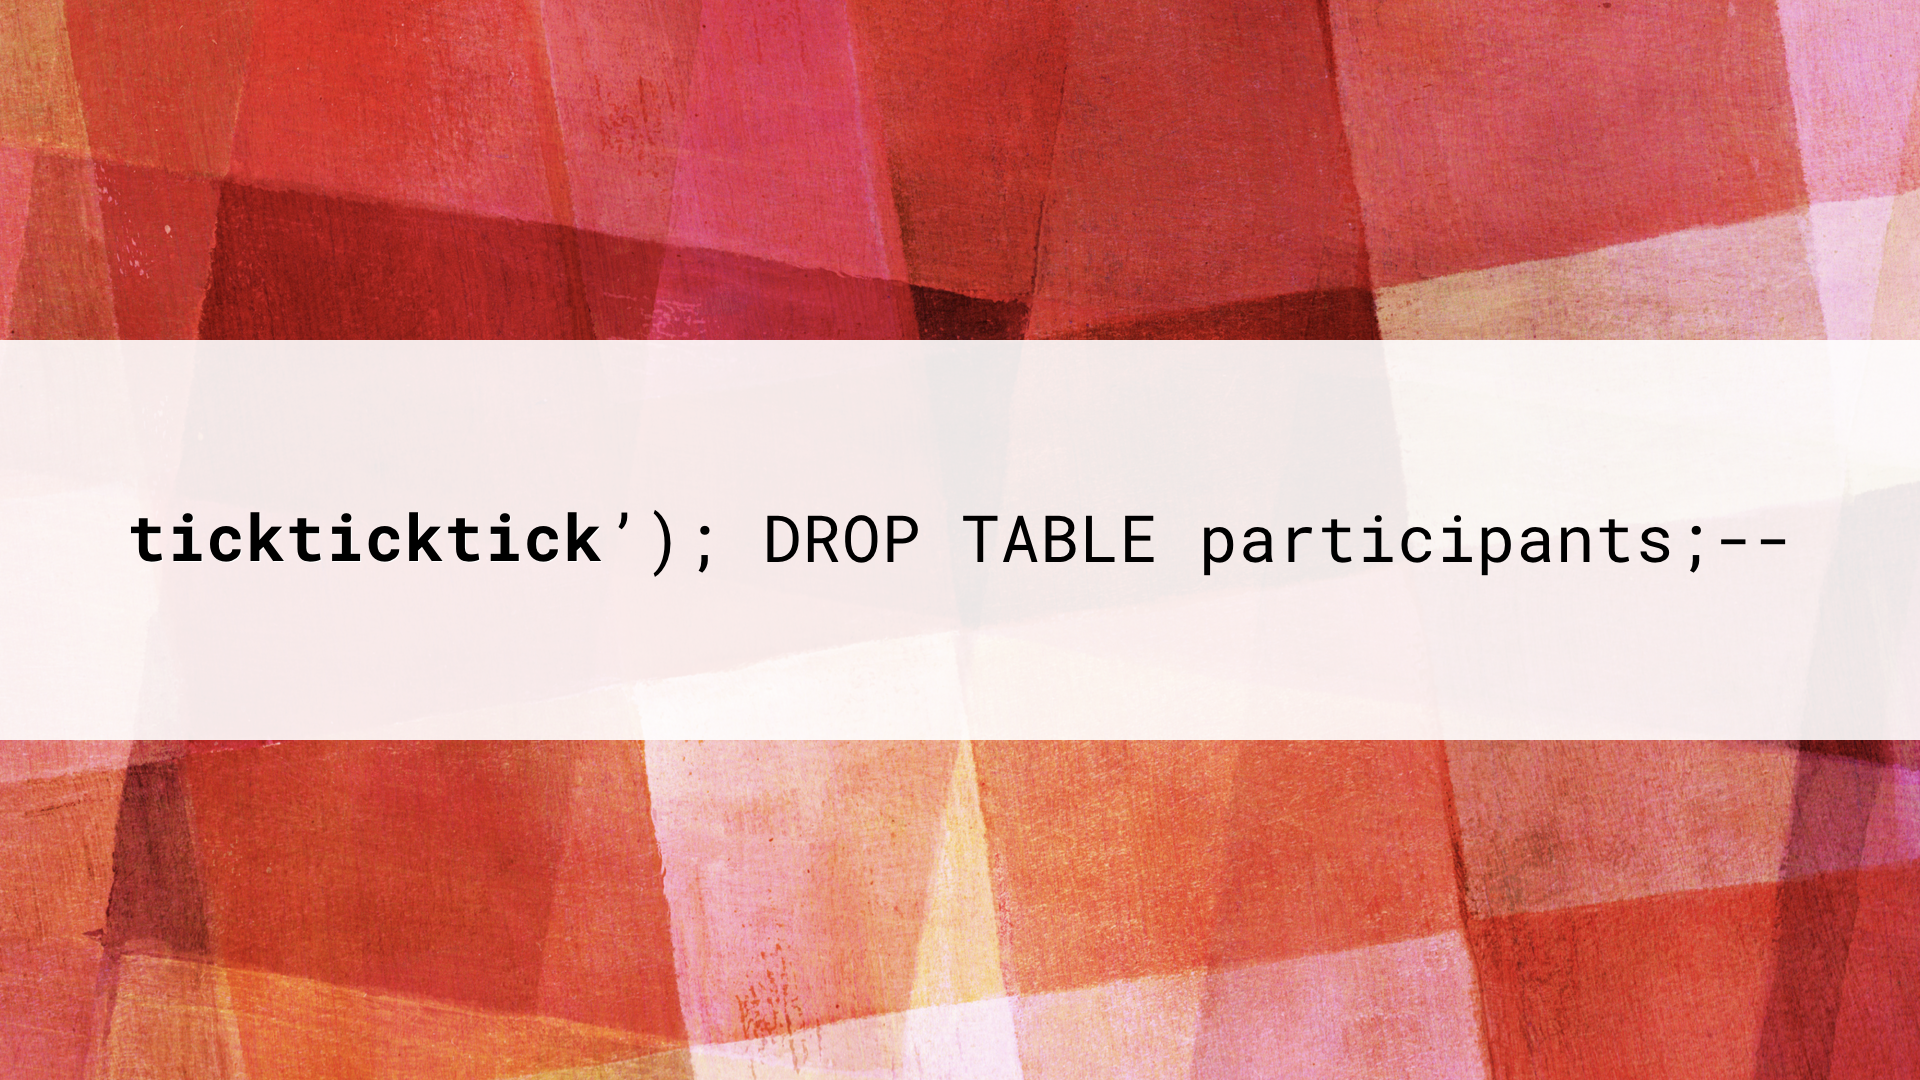 tickticktick-presentation.003.png